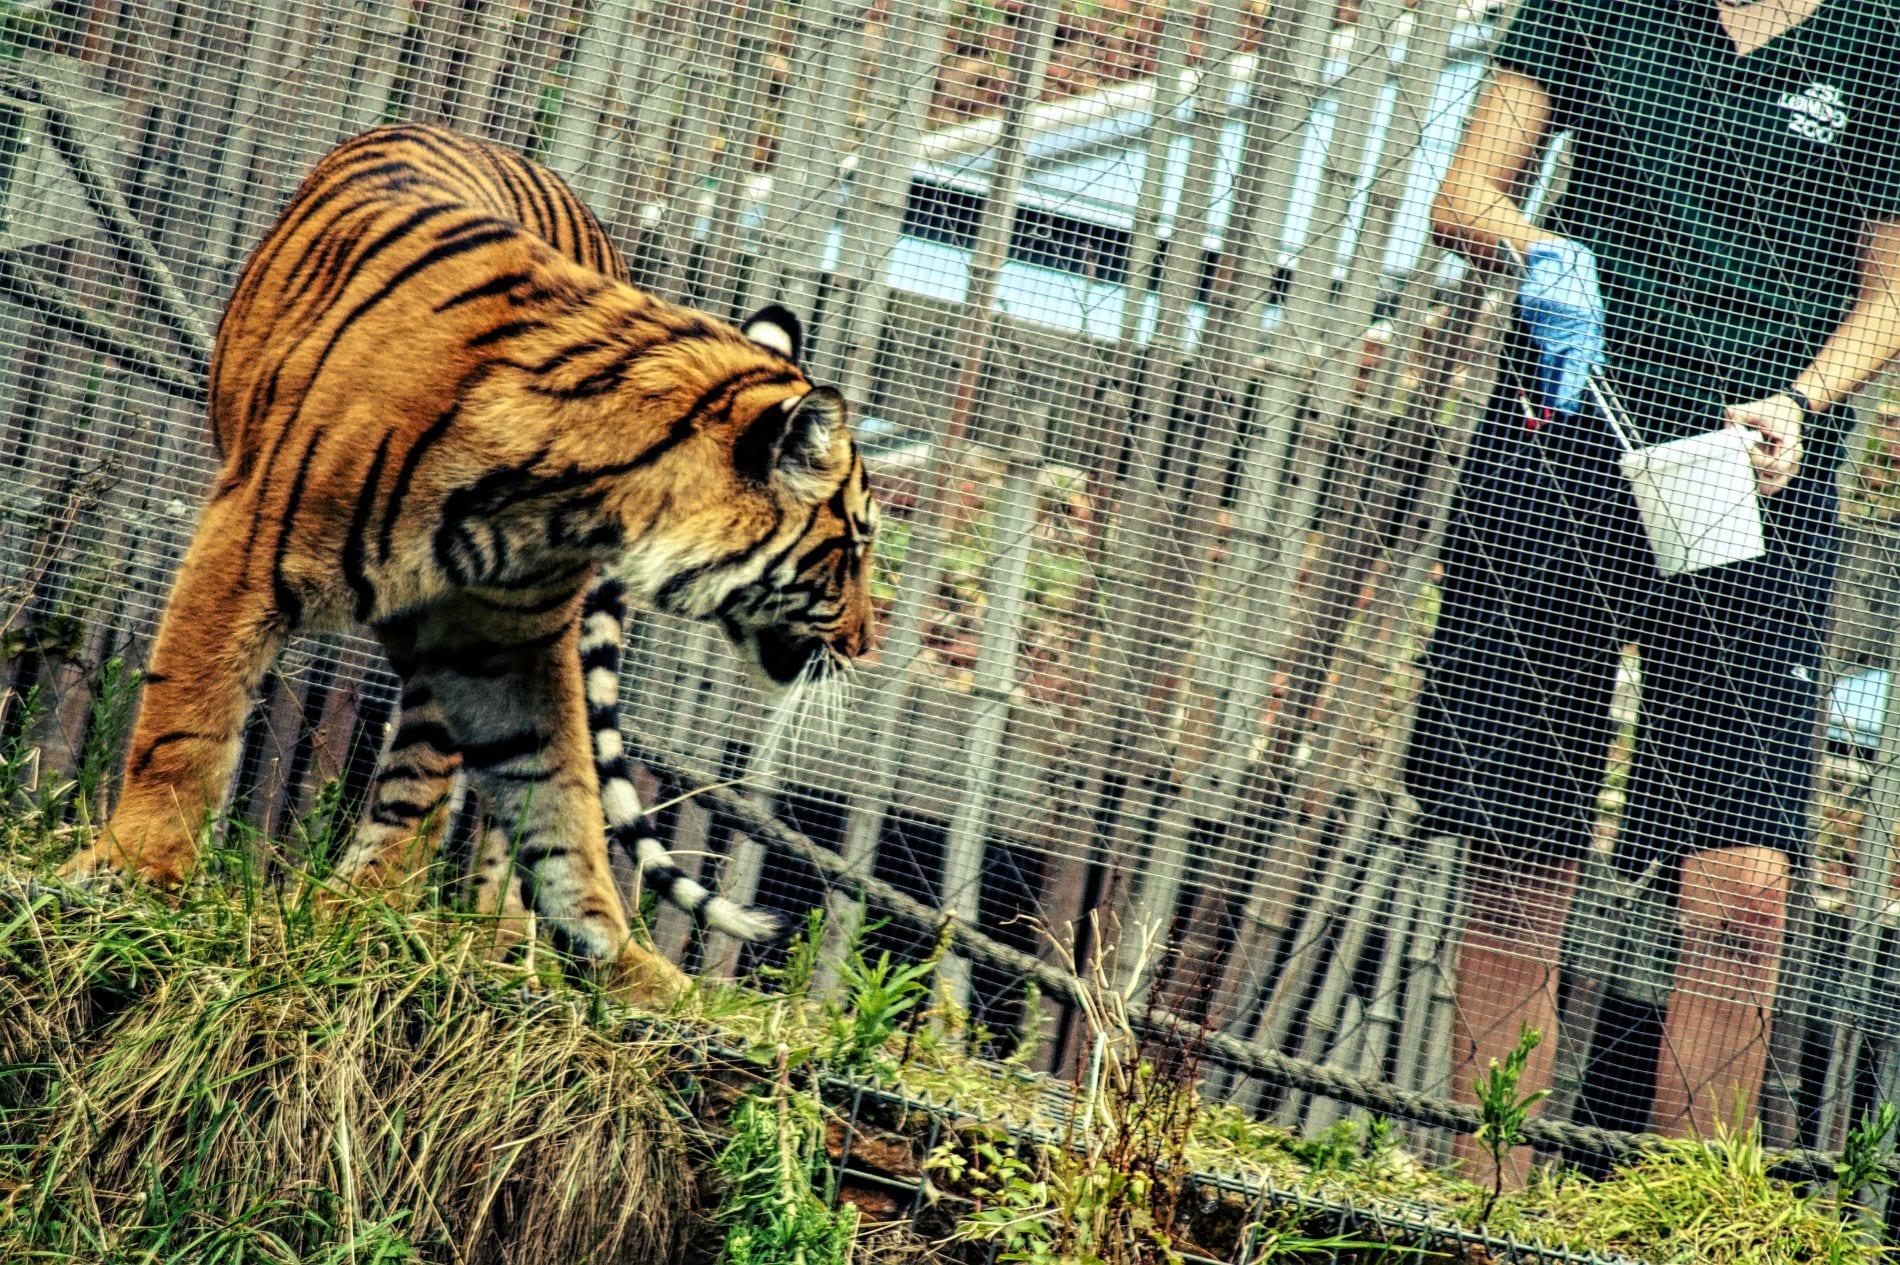 london-zoo-tiger-fuetterung-1.jpg